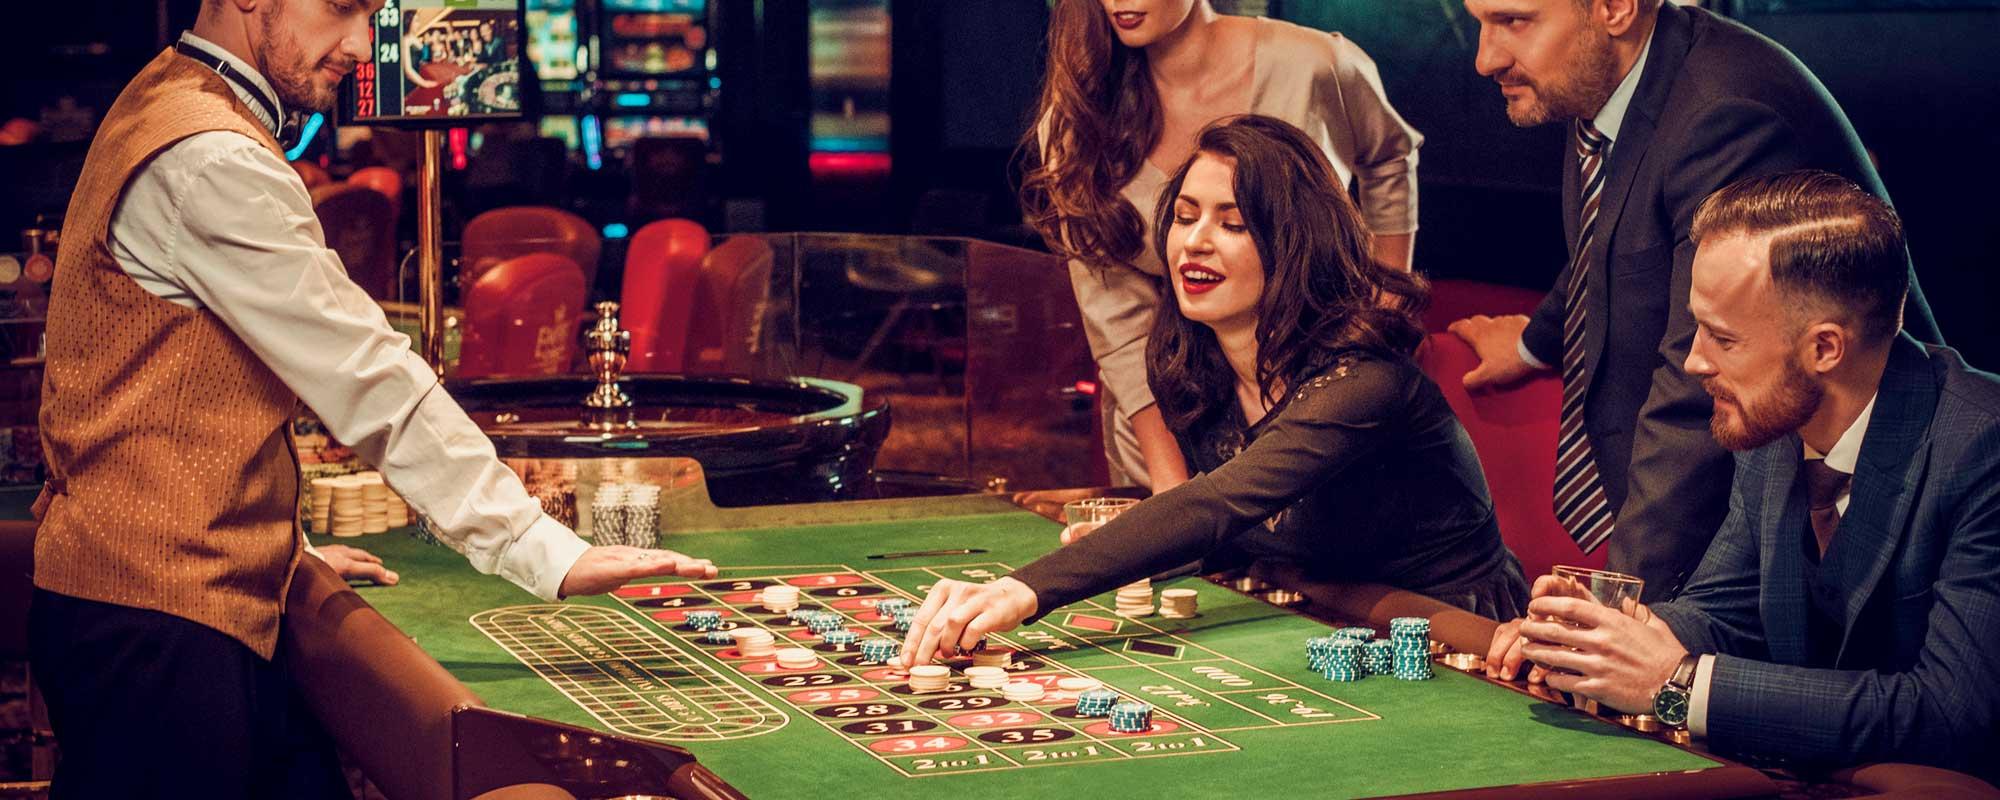 Details About Online Casinos.